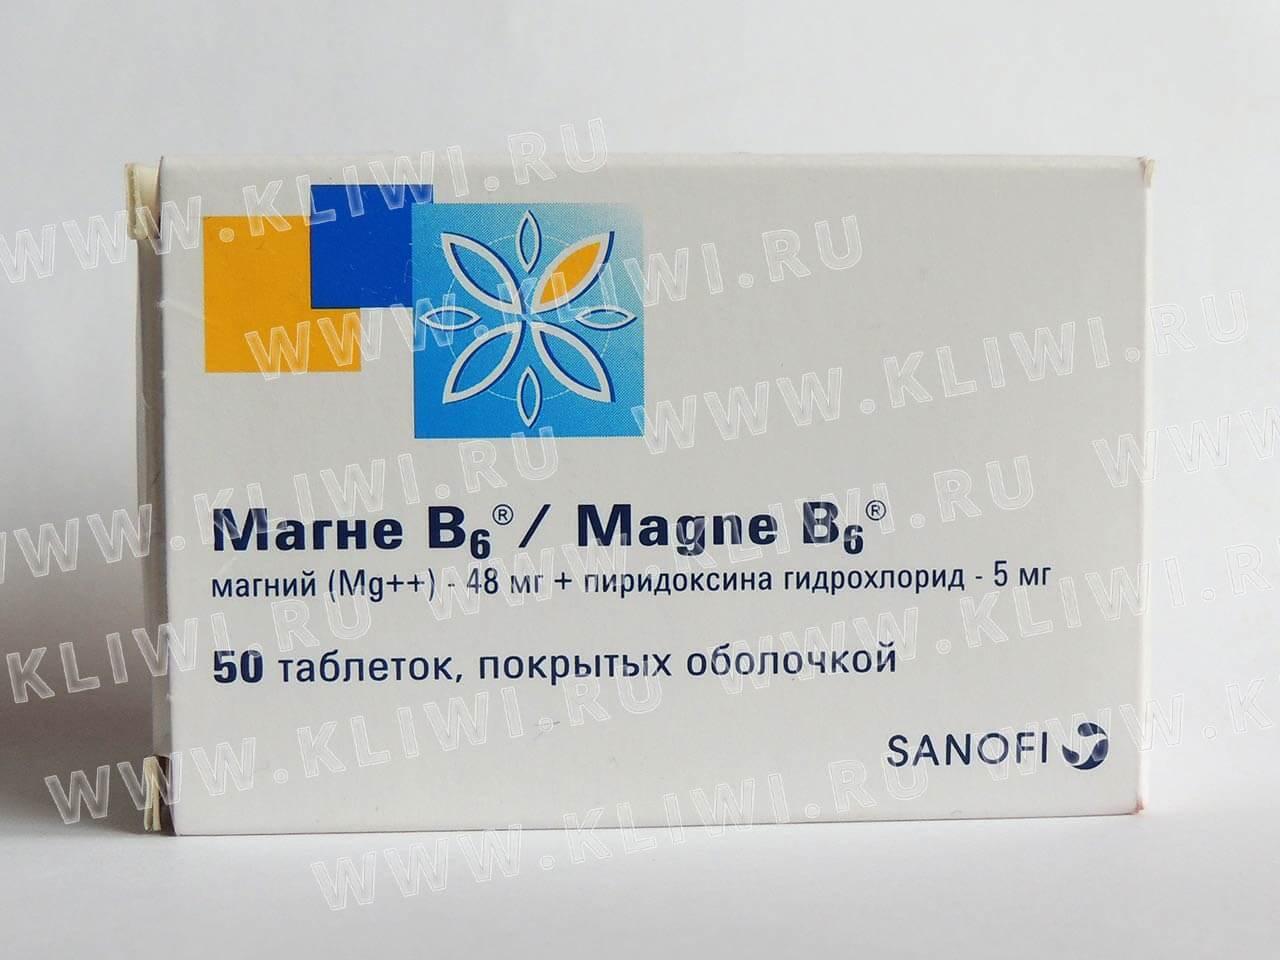 magnis plius nuo hipertenzijos